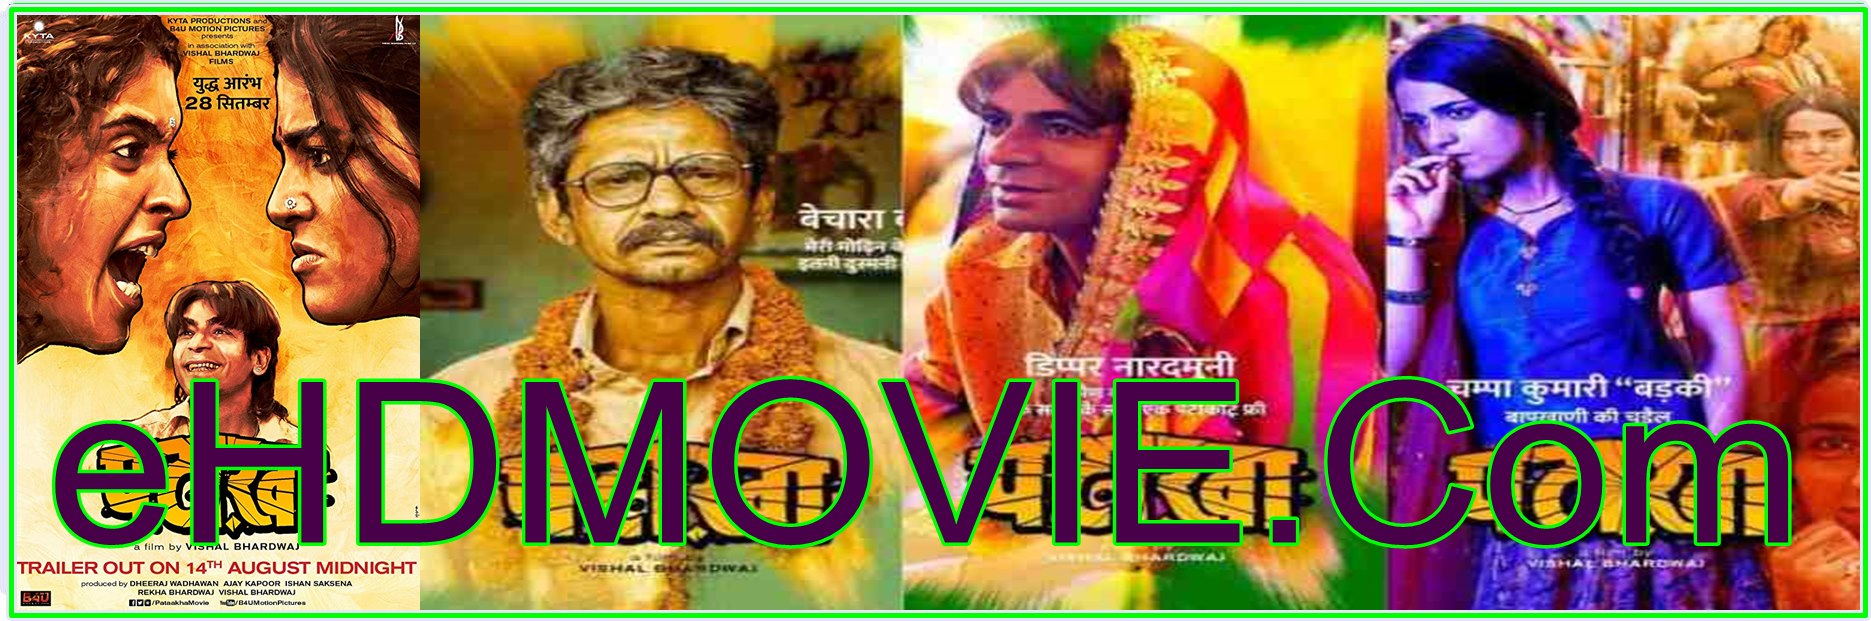 Pataakha 2018 Full Movie Hindi 1080p - 720p - HEVC - 480p ORG WEB-DL 400MB - 700MB - 1.4GB - 2.2GB ESubs Free Download